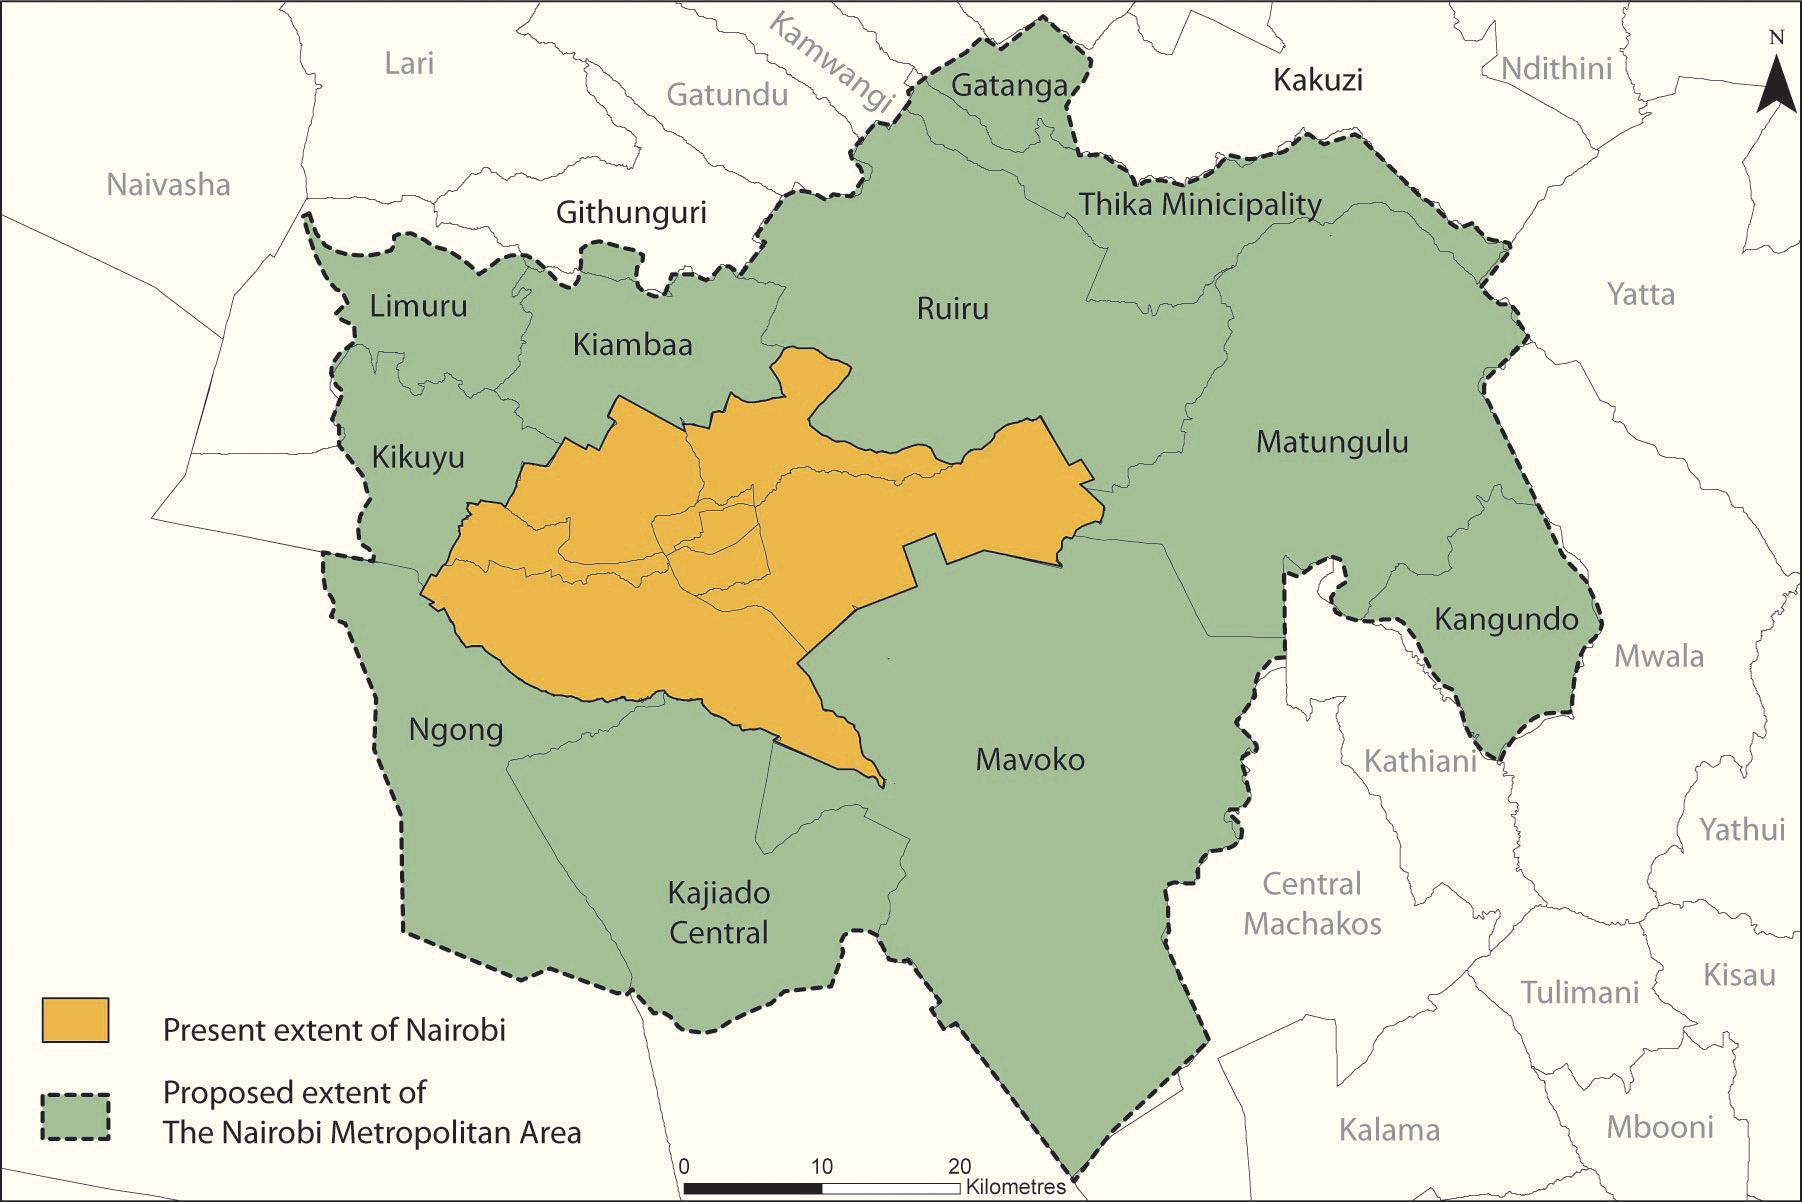 UNEPGRIDSioux Falls - nairobi map